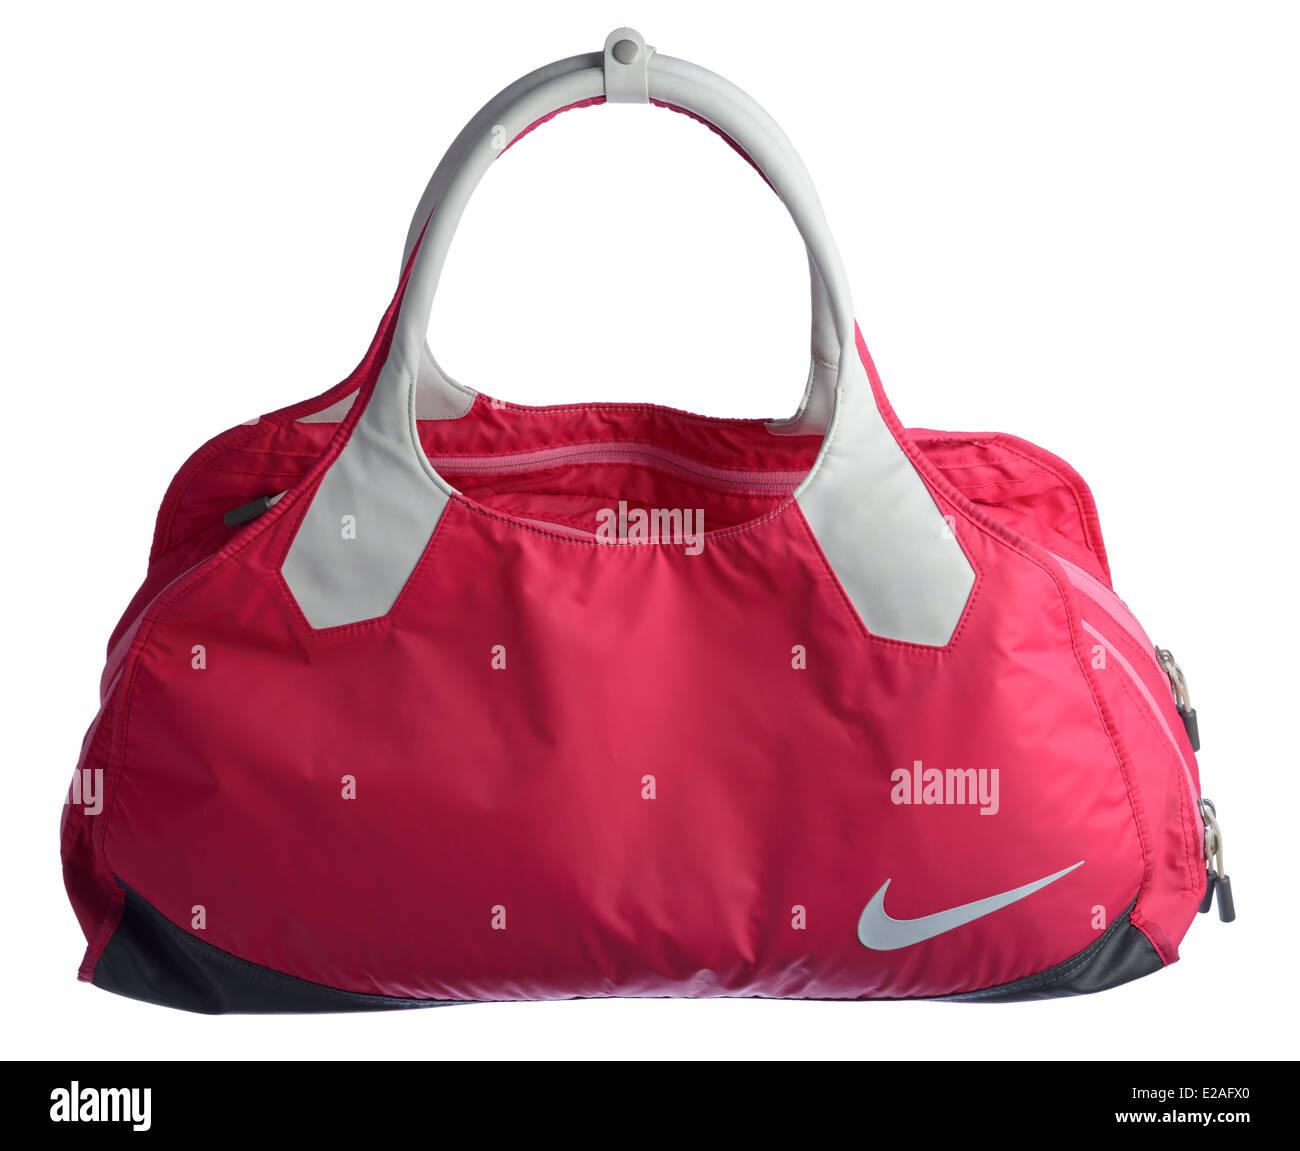 Insignia Punto muerto idiota  Pink Nike gym bag cut out isolated on white background Stock Photo - Alamy